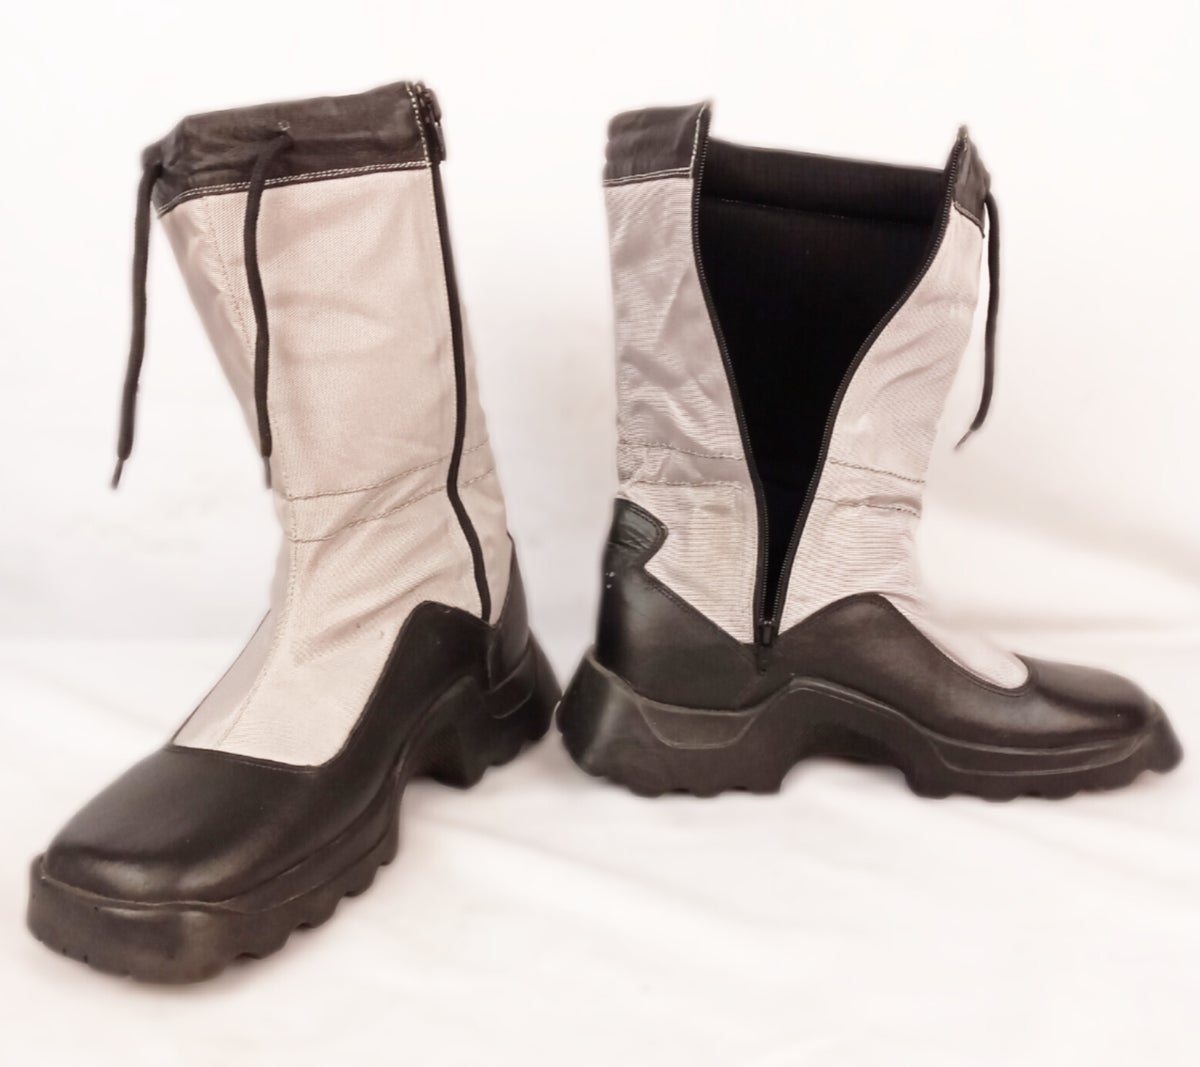 Image of #26 - B Grade from Stock - Shoe Size EU 39